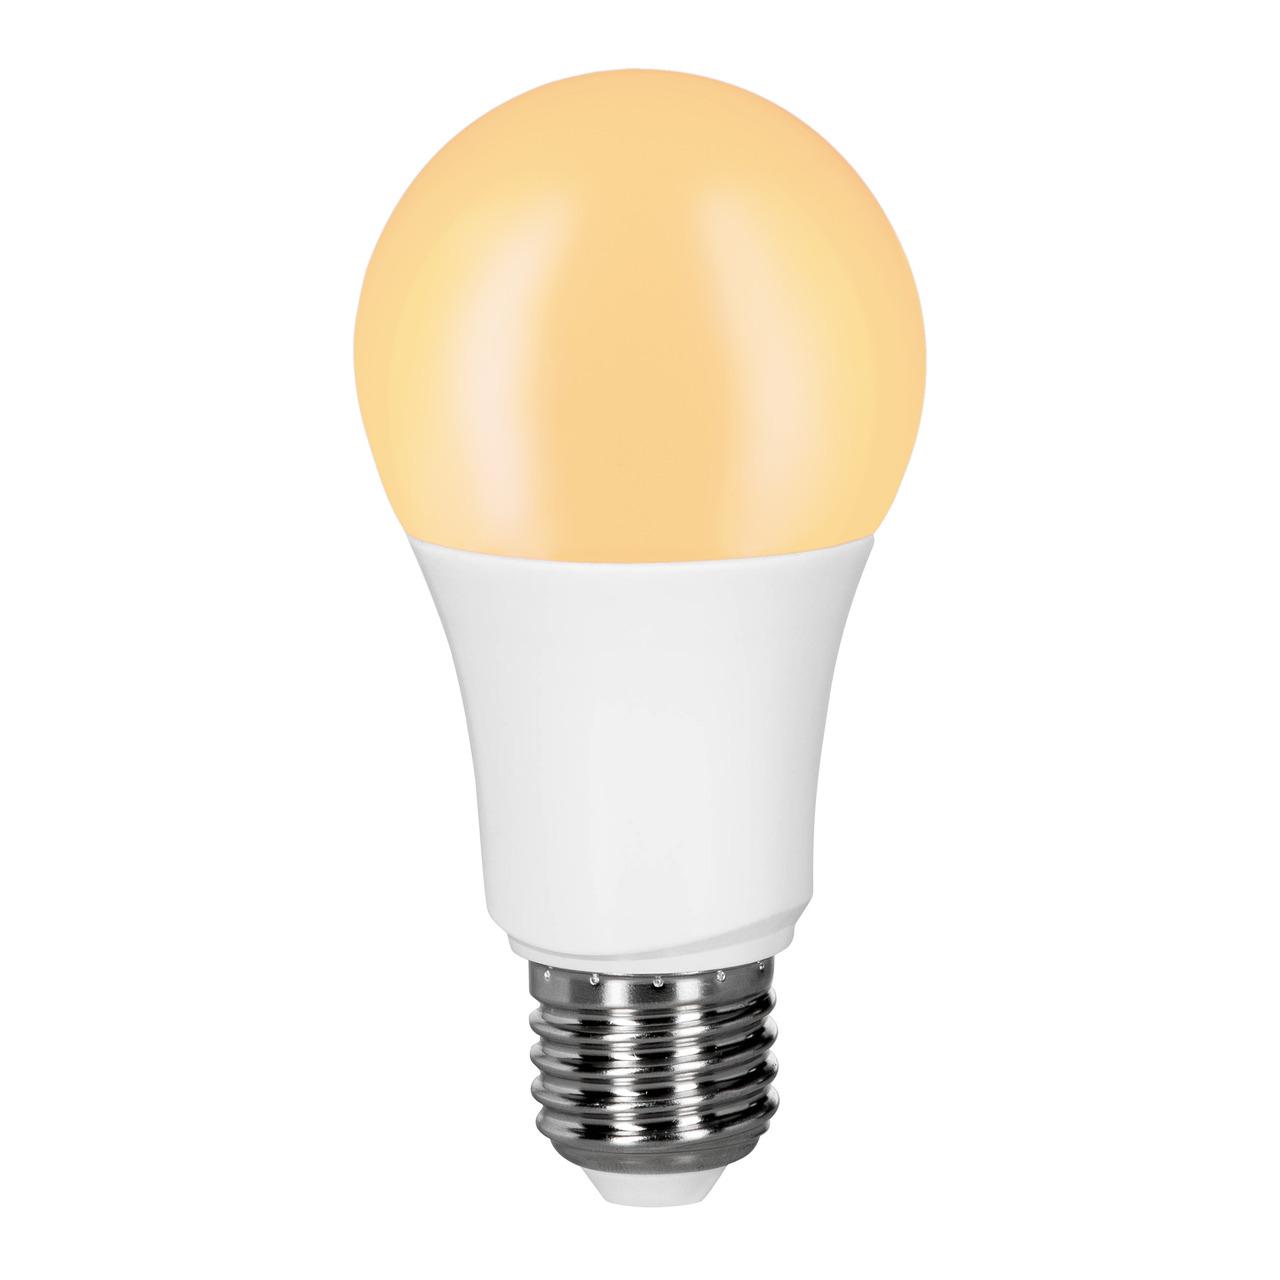 Müller Licht tint 9-W-LED-Lampe E27- warmweiss- dimmbar (Zigbee)